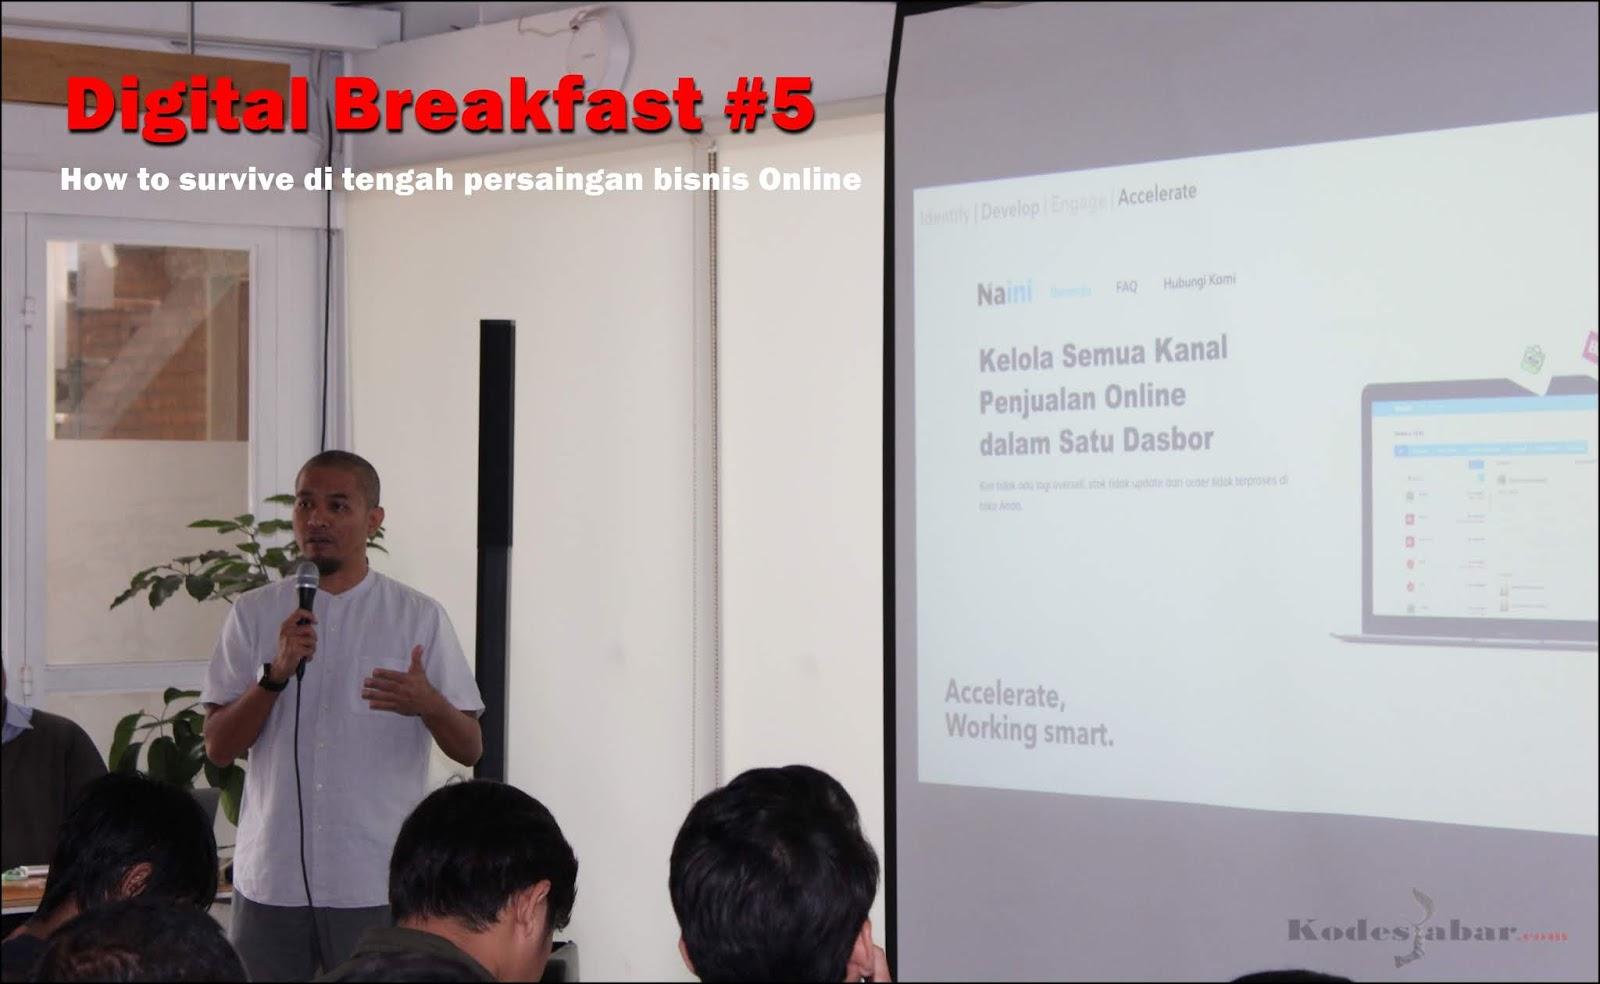 Digital Breakfast #5 Solusi UKM di Bandung